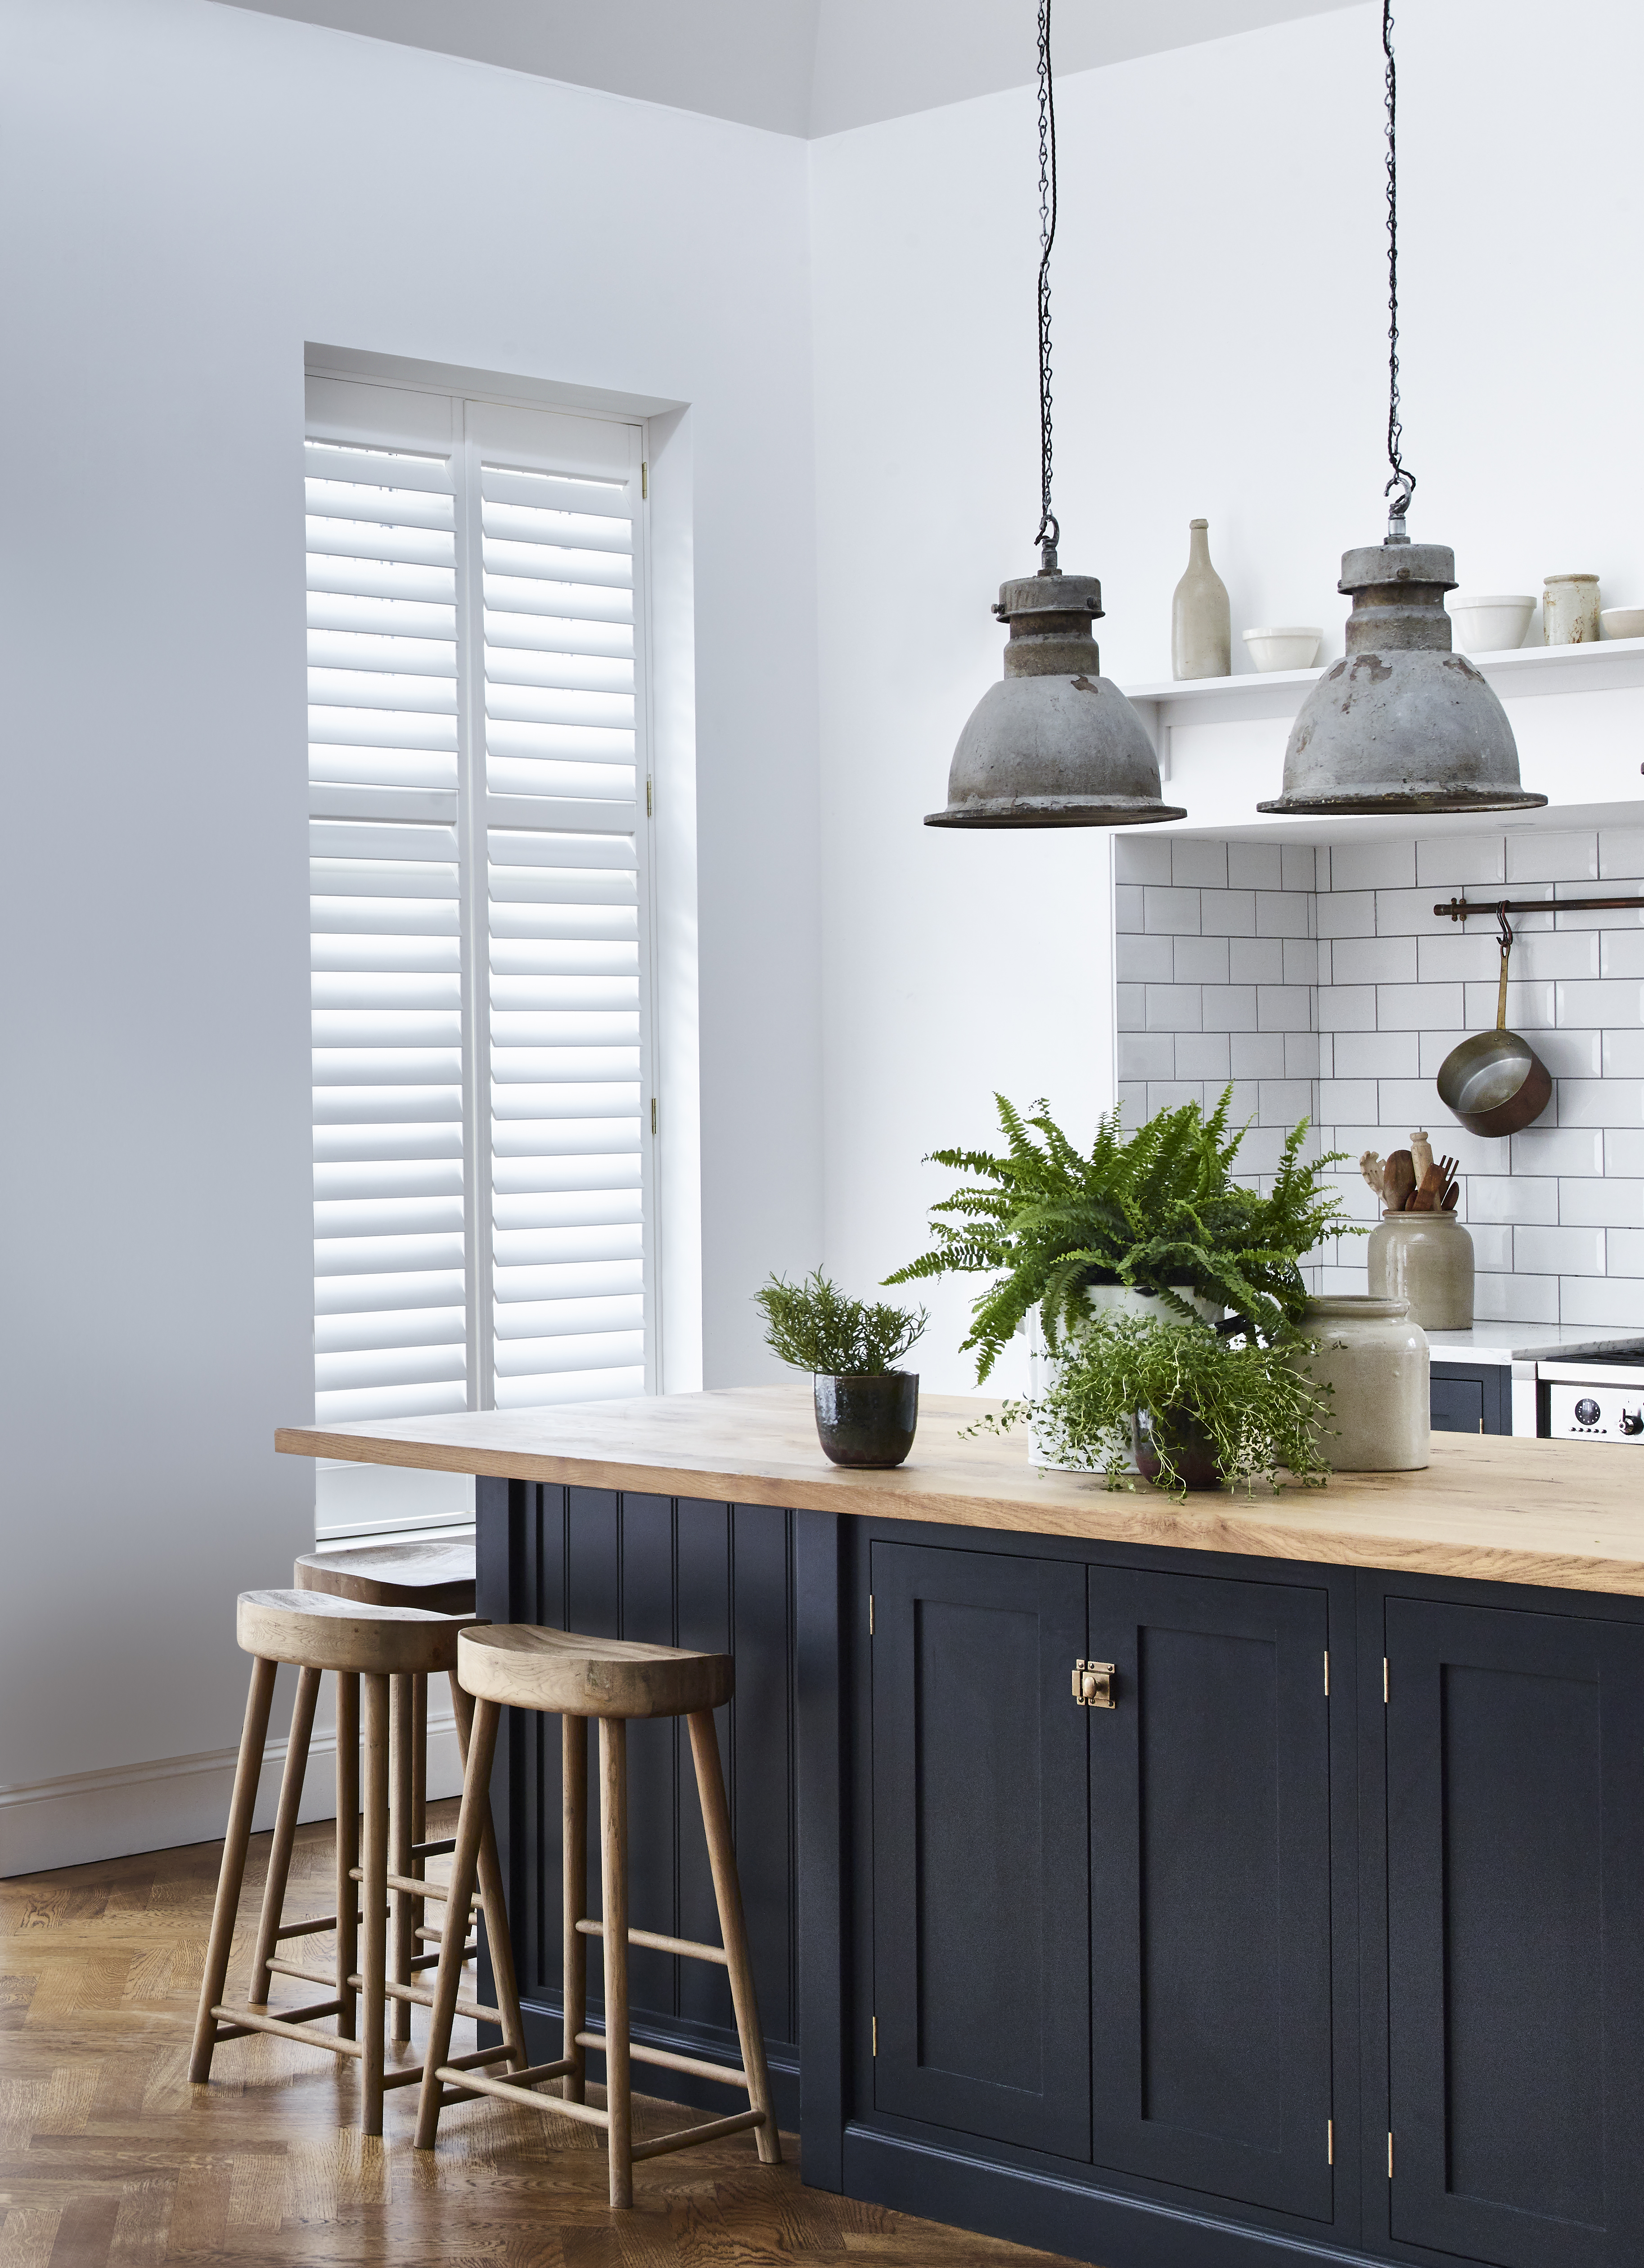 14 kitchen lighting ideas – pretty but practical ways to light